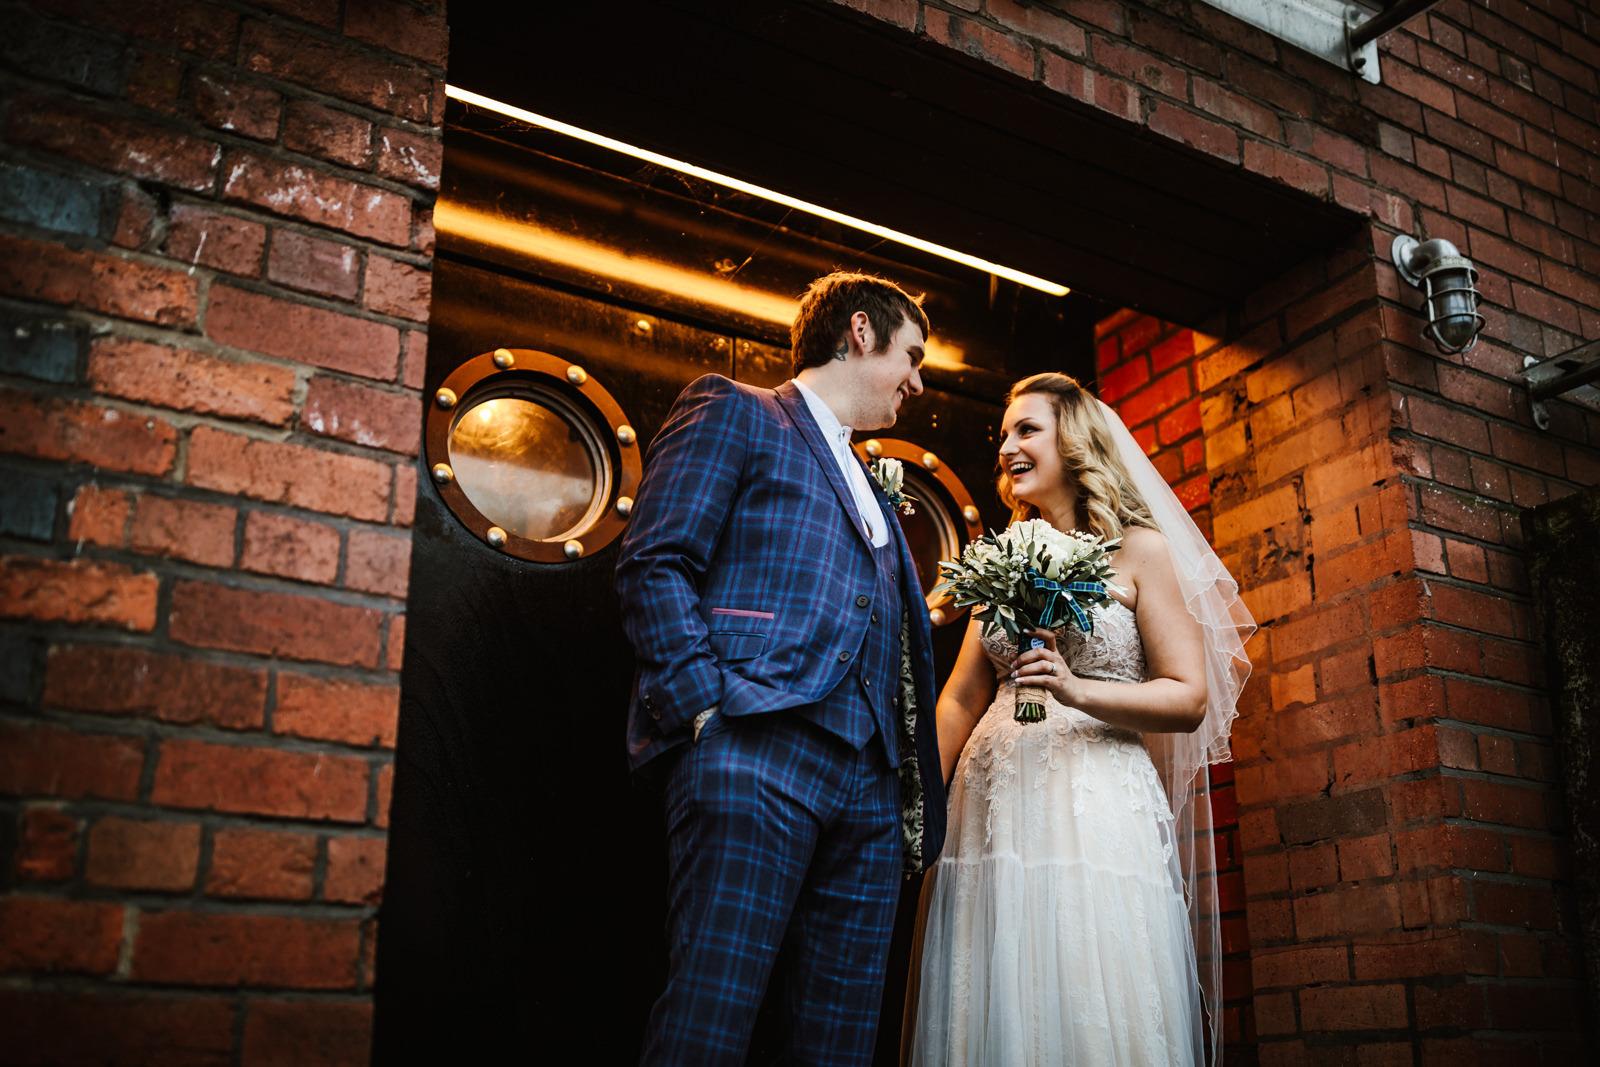 Weddings at Victoria Warehouse